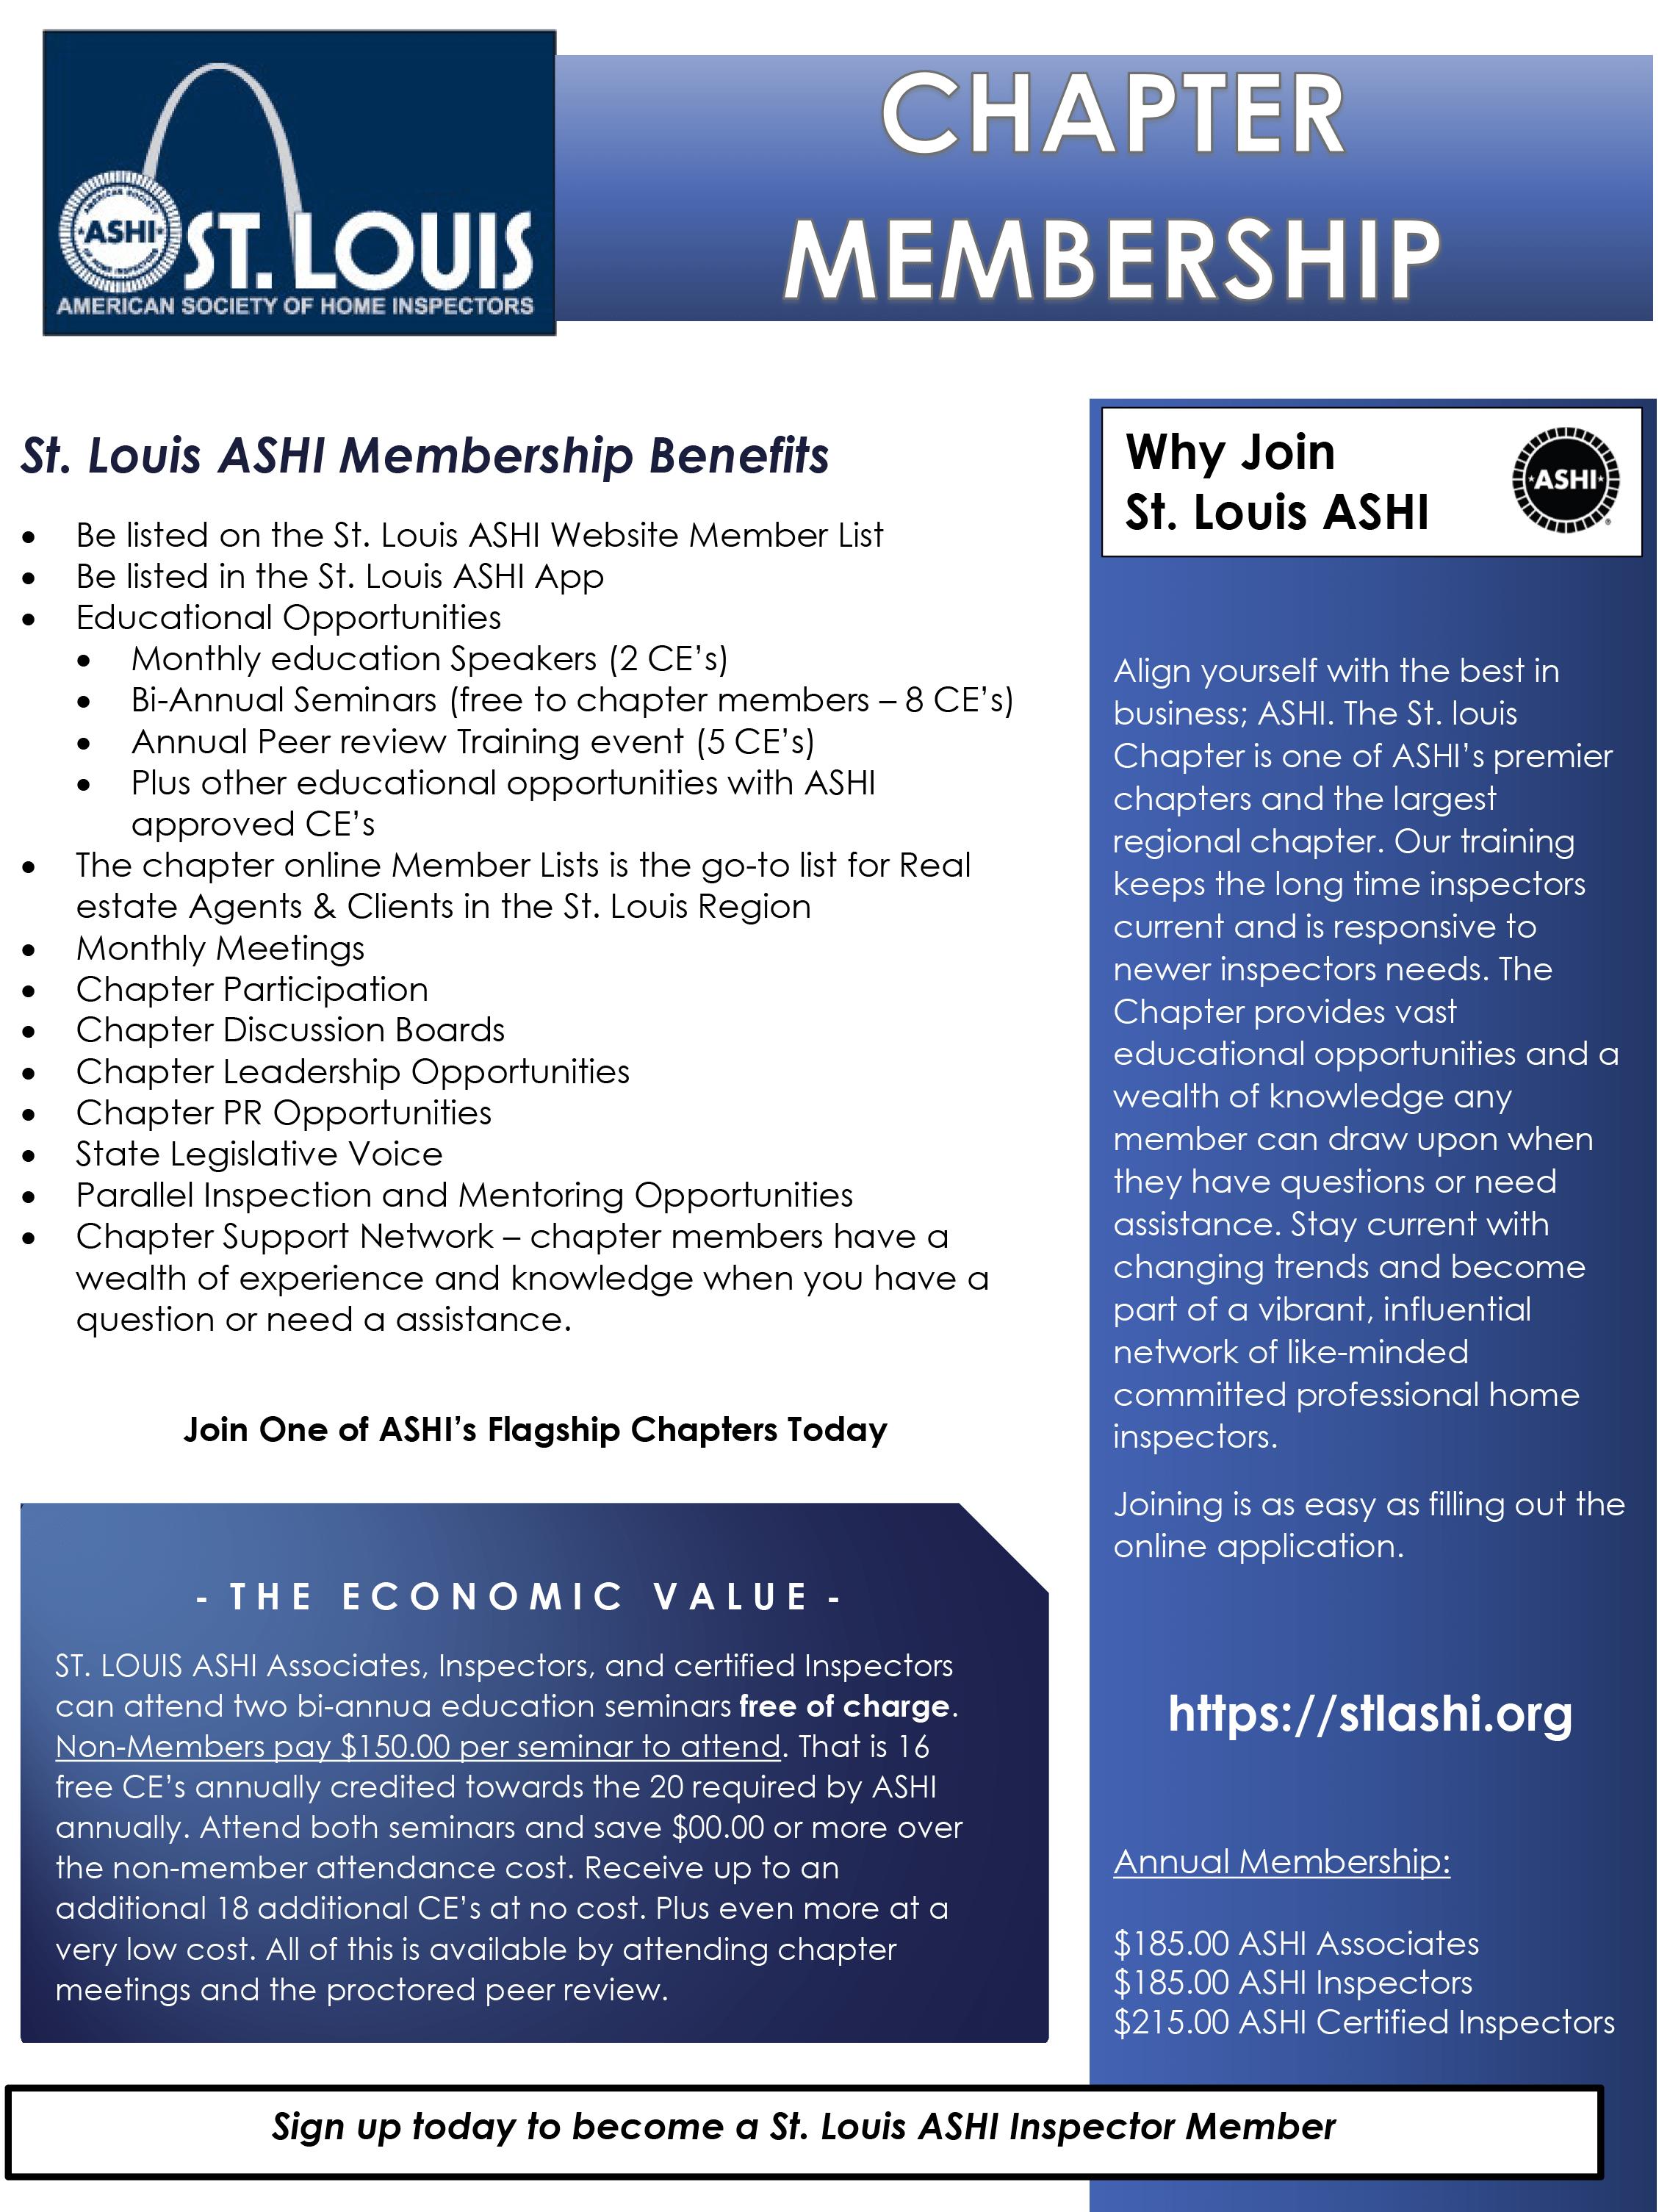 Chapter Membership Flyer